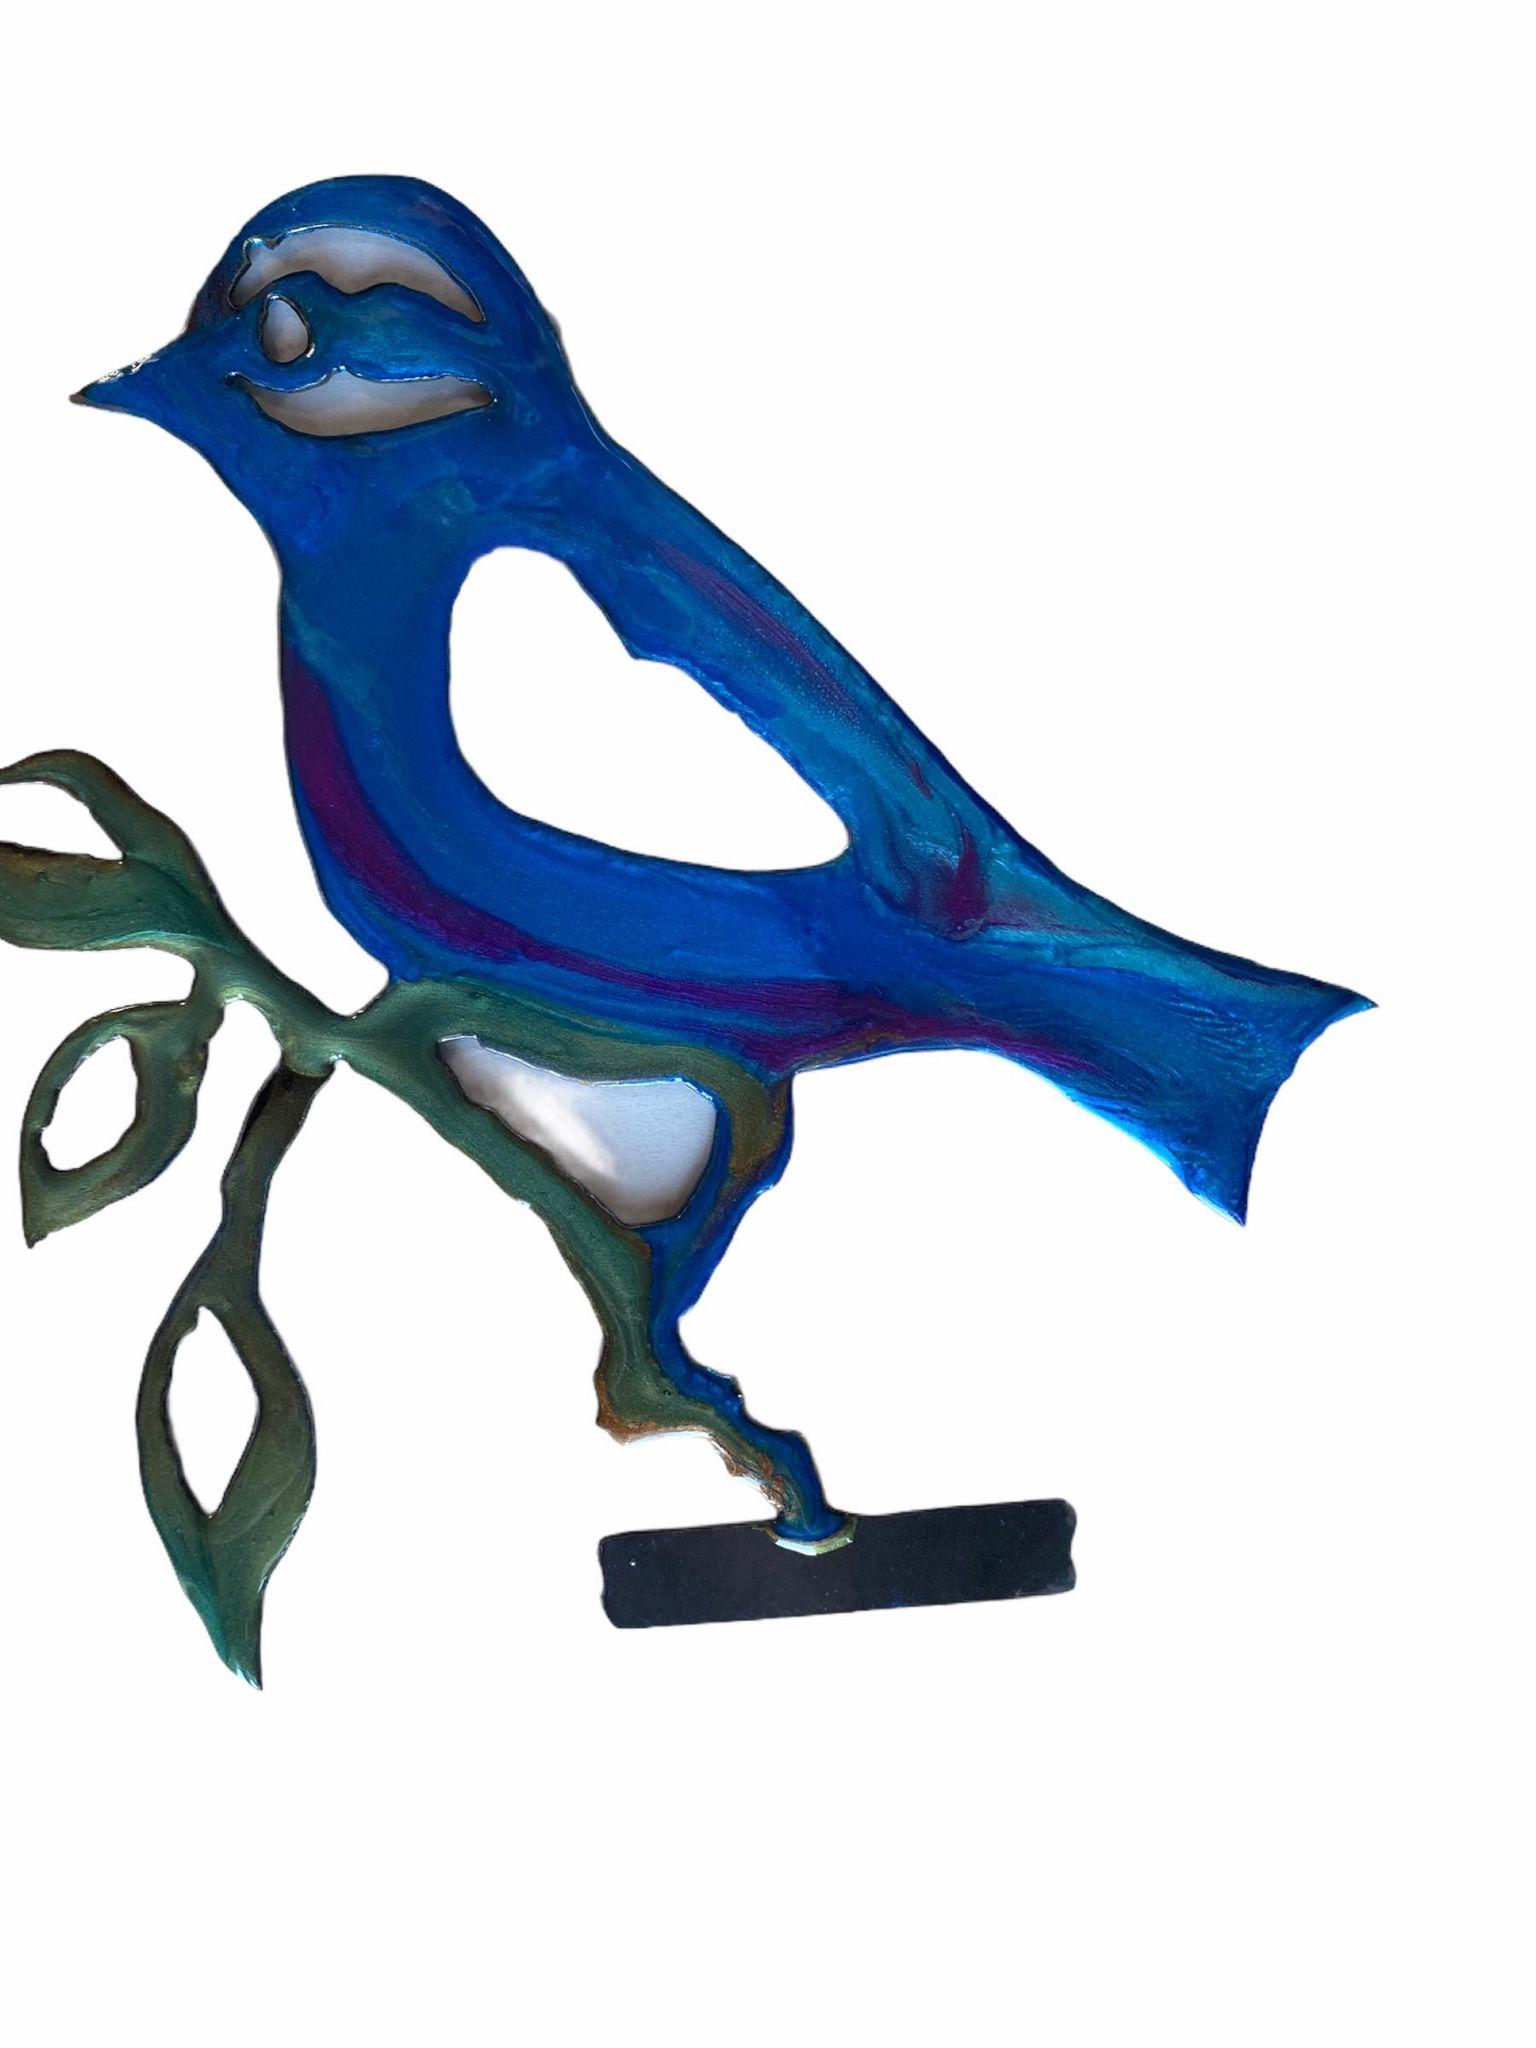 Plasma Resin Garden Art Bird on a branch